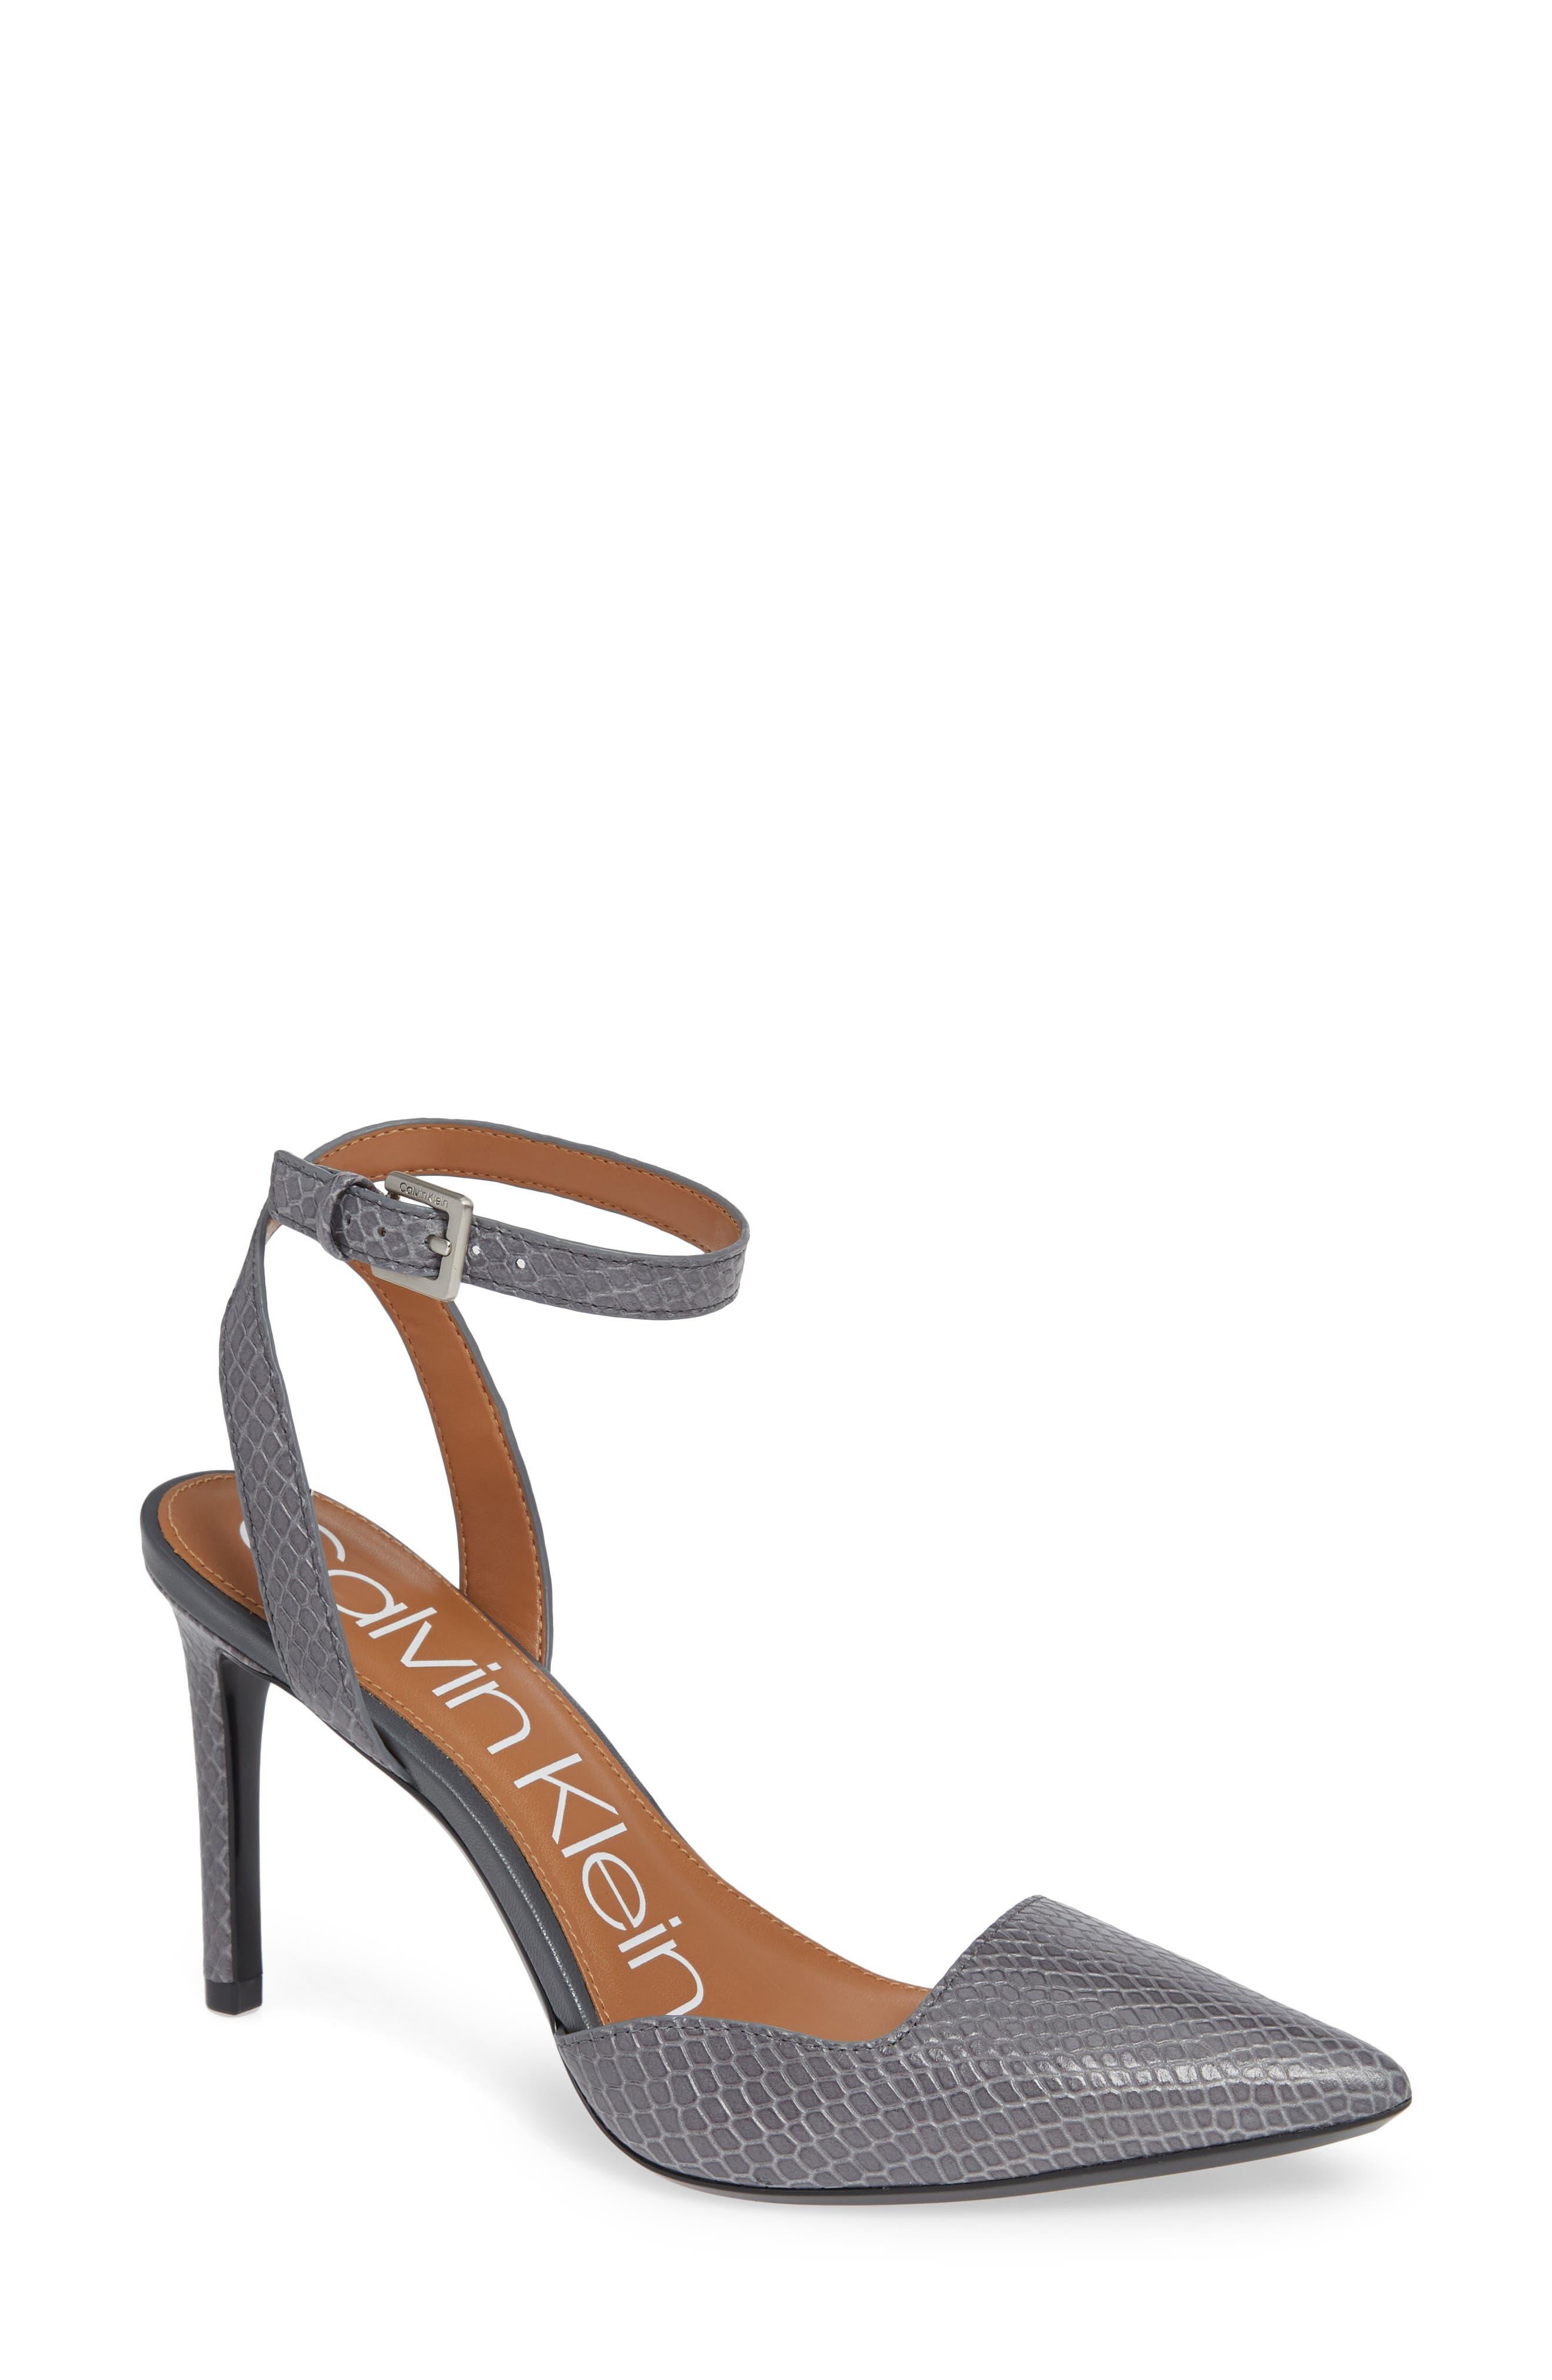 CALVIN KLEIN Raffaela Ankle Strap Pump, Main, color, STEEL GREYSTONE LEATHER